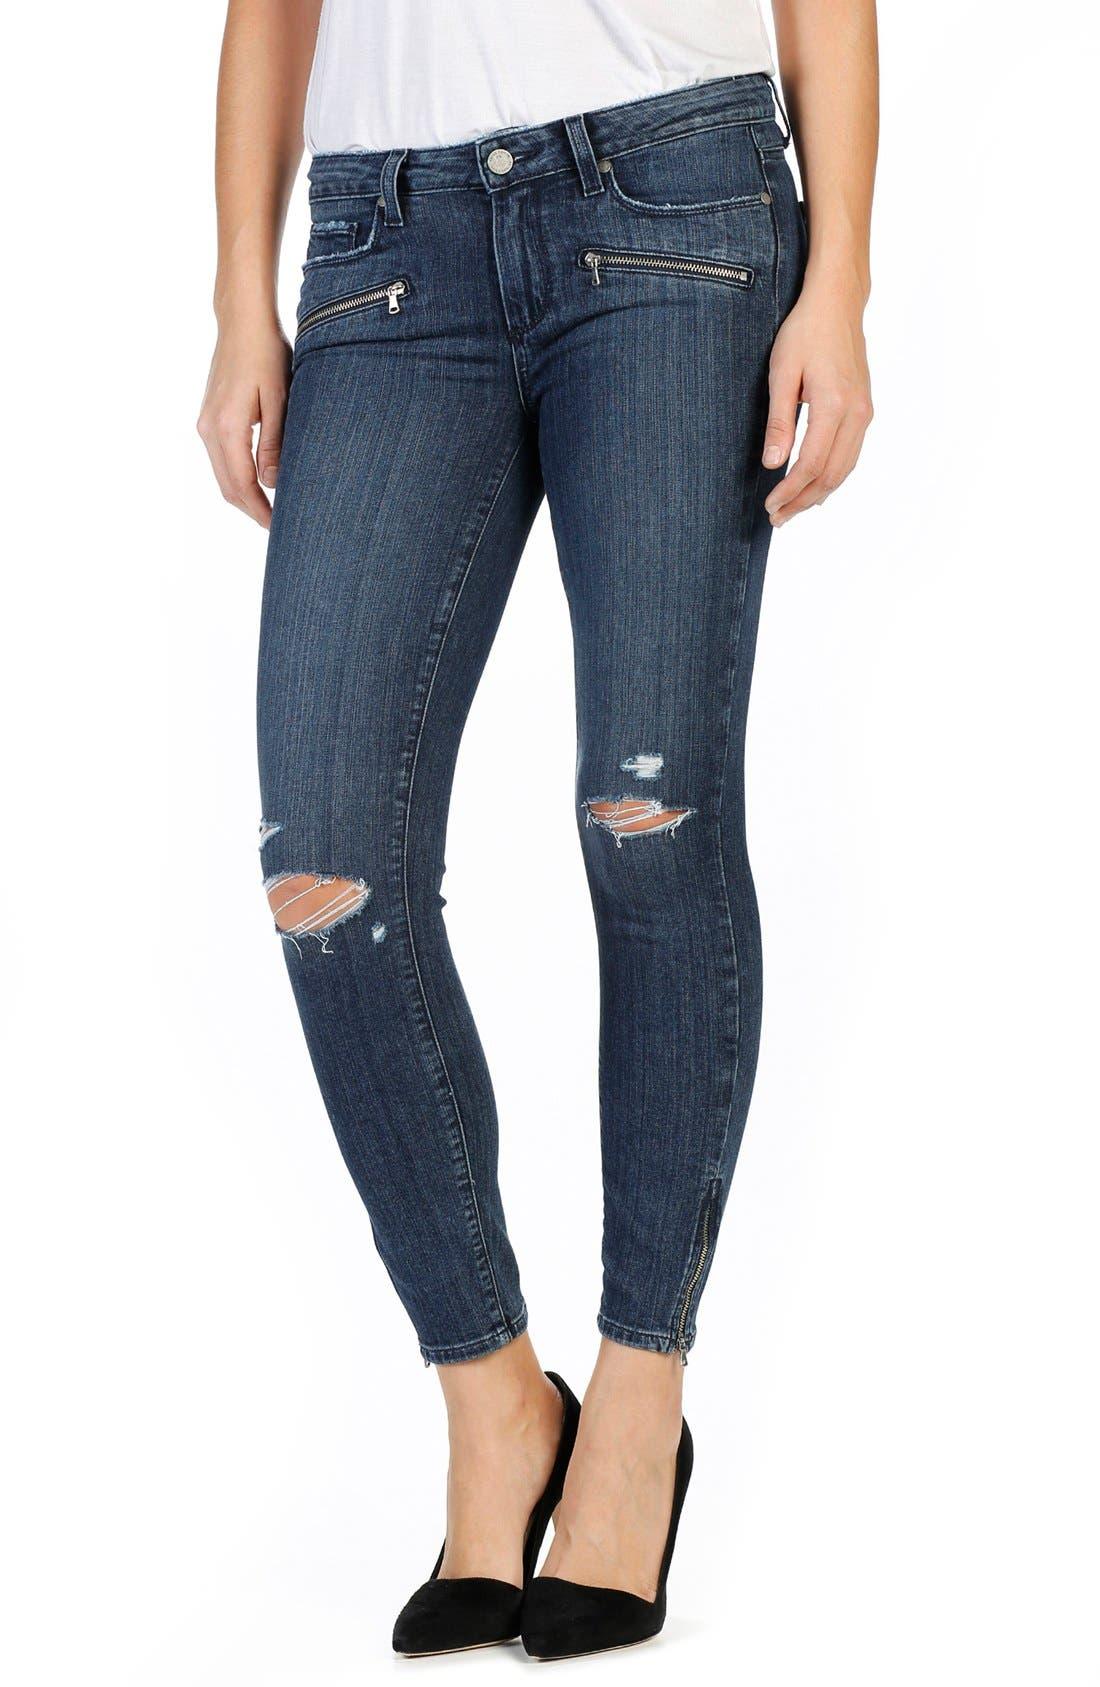 Transcend - Jane Zip Detail Ankle Jeans,                         Main,                         color, Lani Destructed No Whiskers